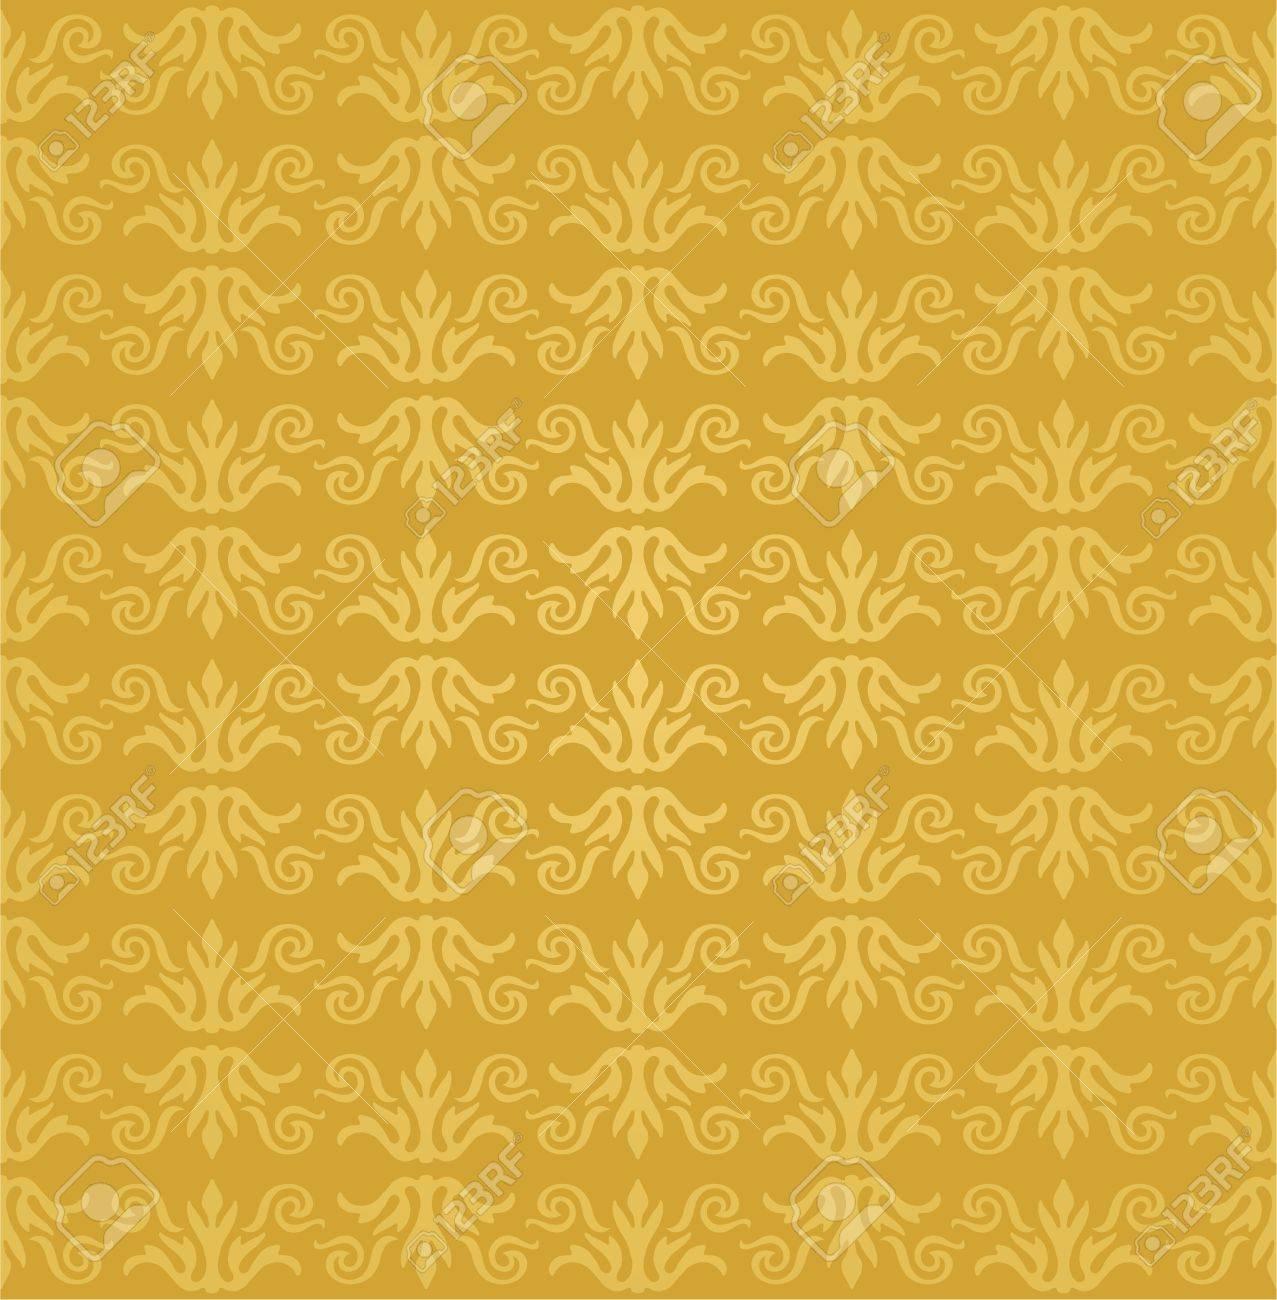 Seamless Golden Floral Wallpaper Pattern Stock Vector